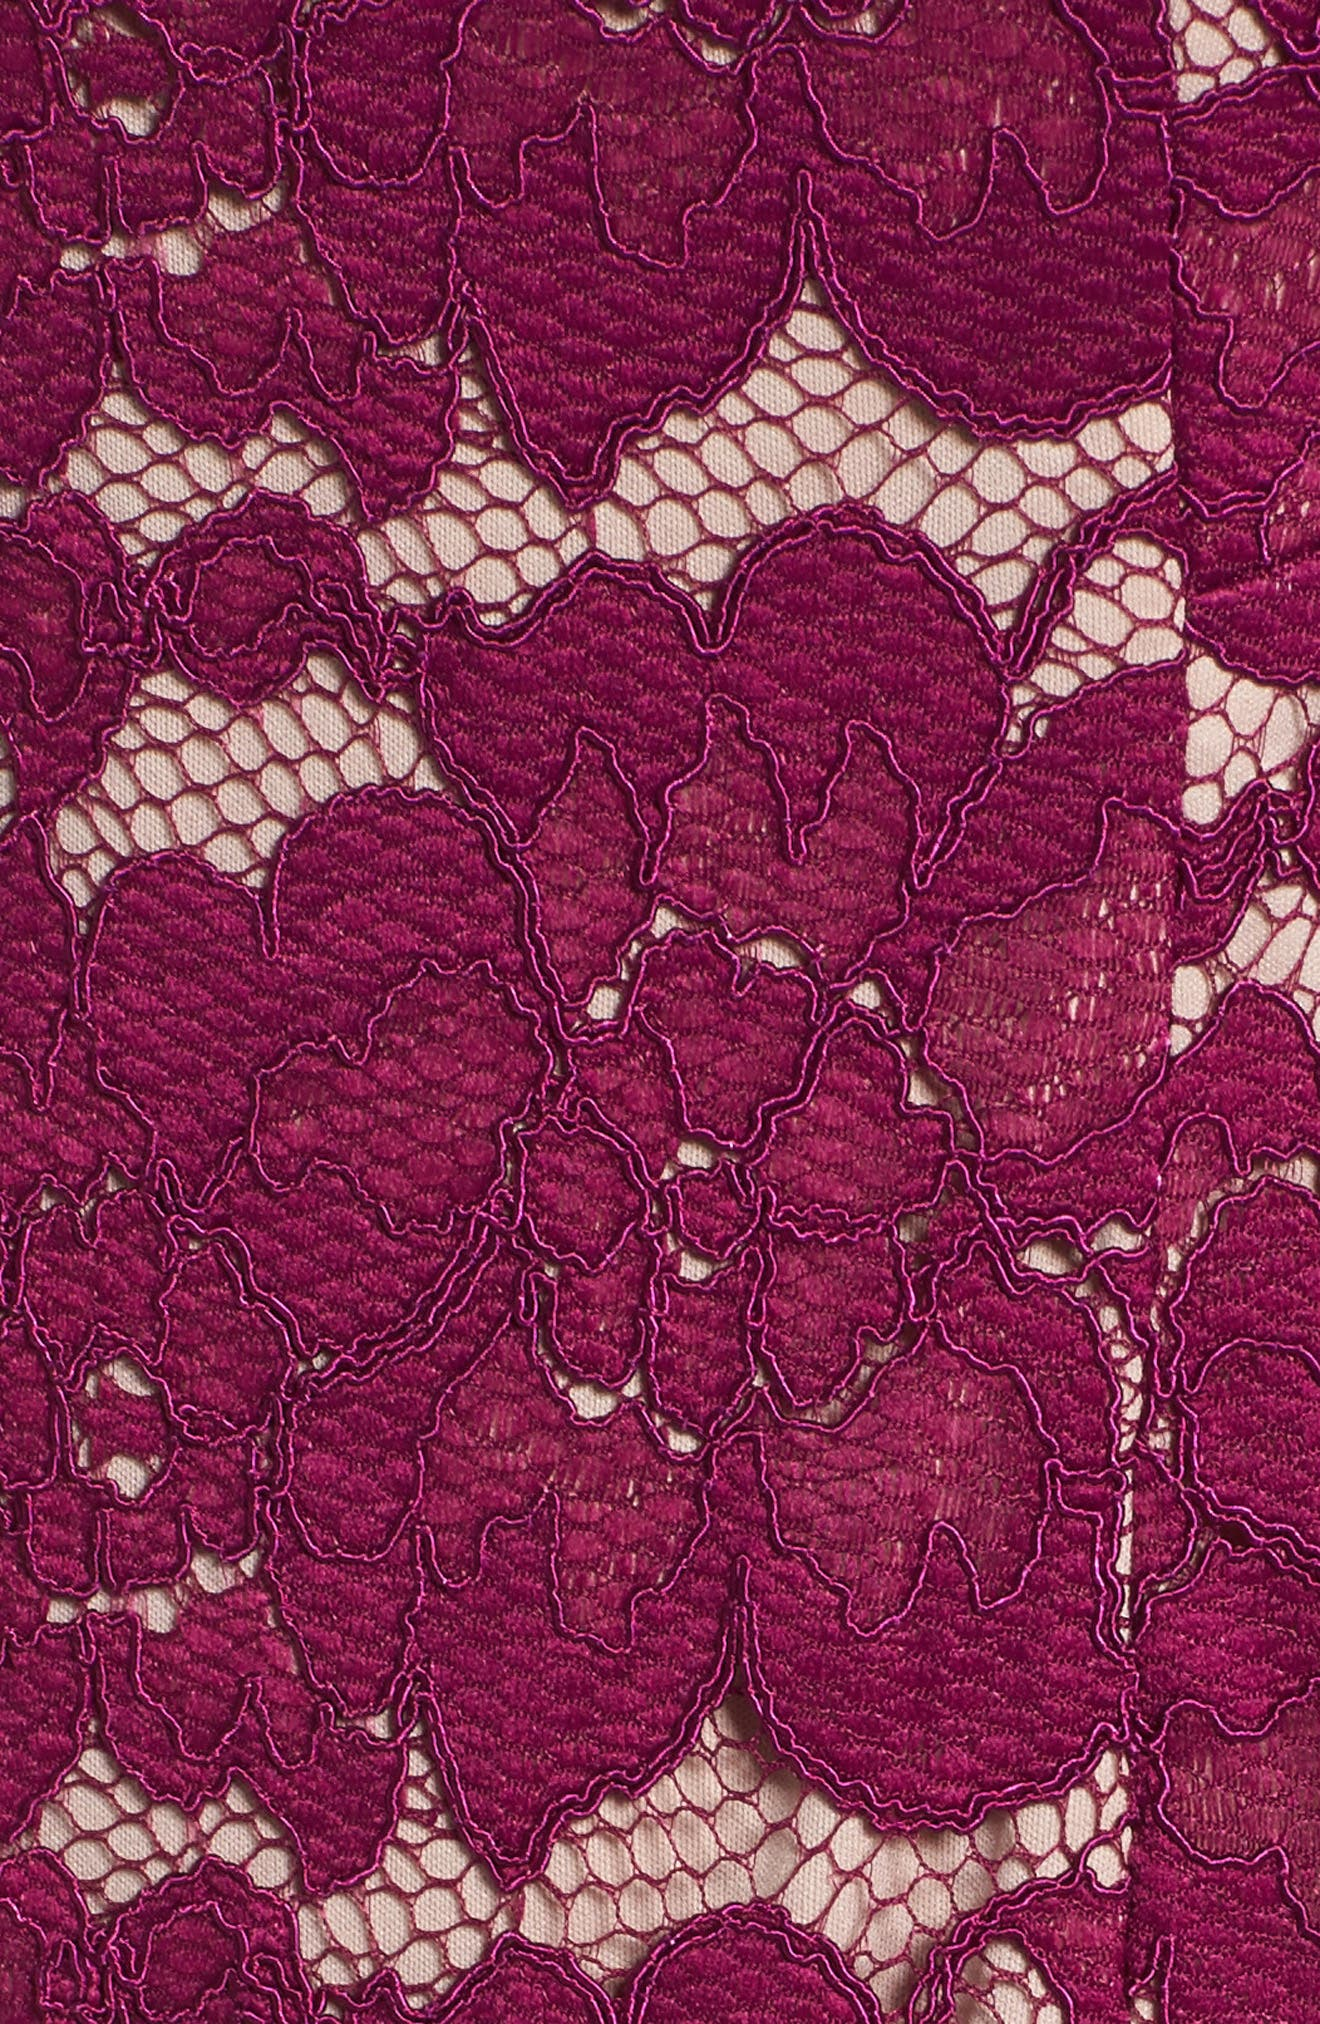 Twin Flower Lace Sheath Dress,                             Alternate thumbnail 5, color,